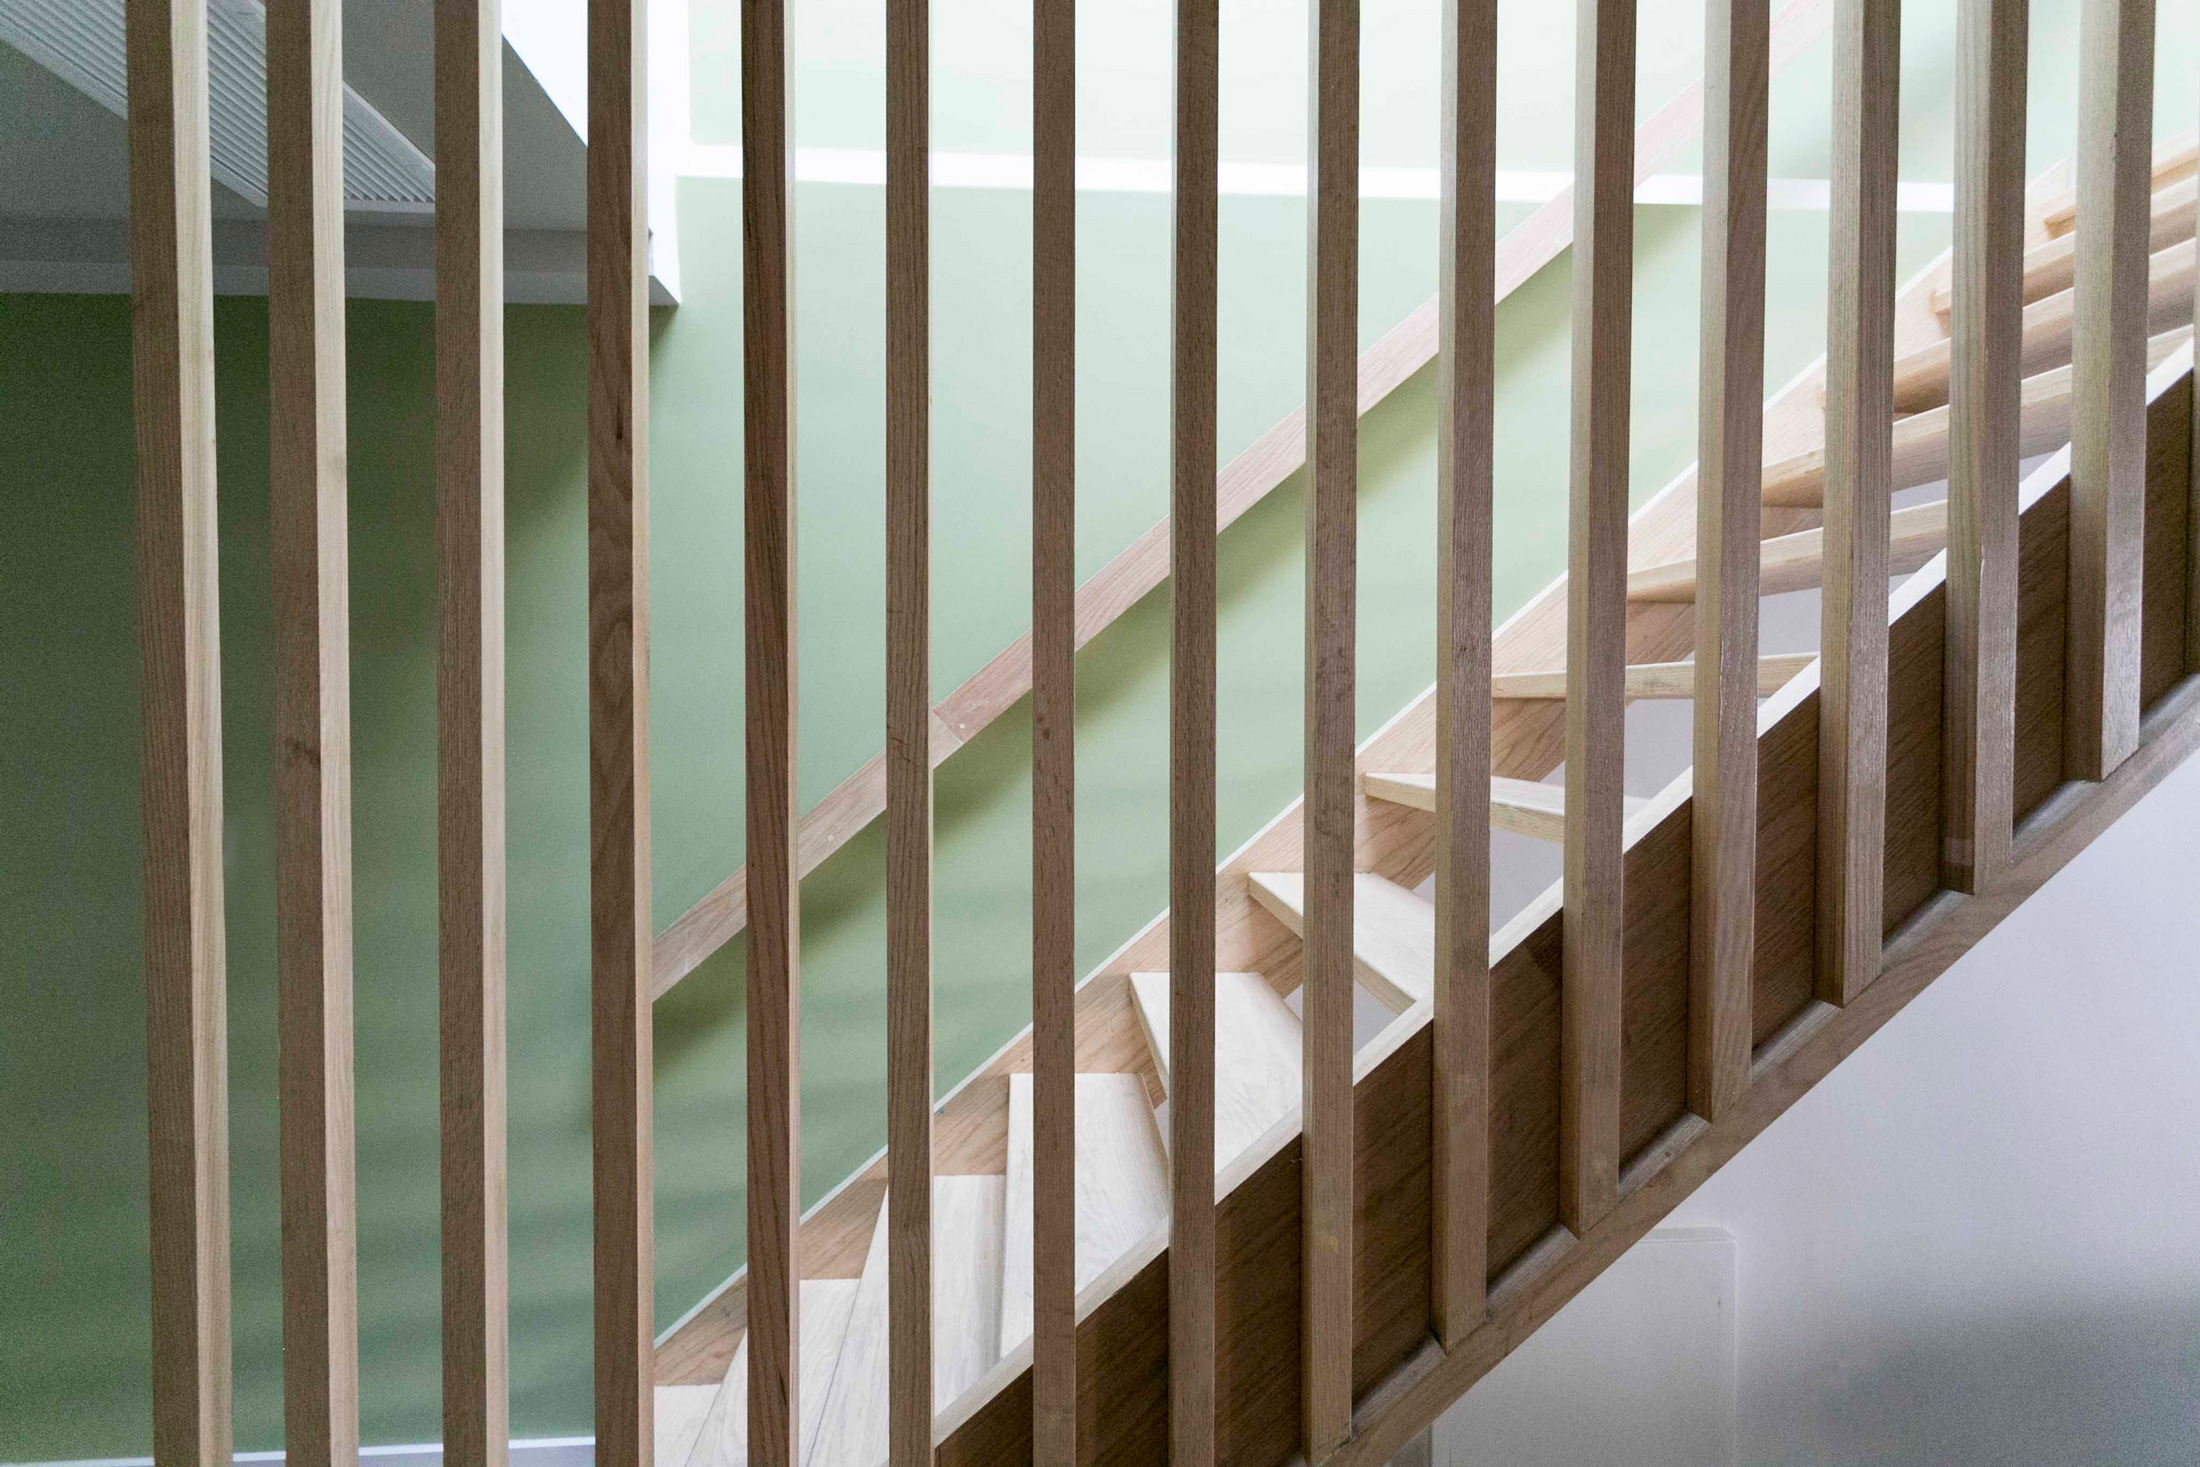 home-design-living-room-ideas-modern-staircase-mid-century-green-walls.jpg